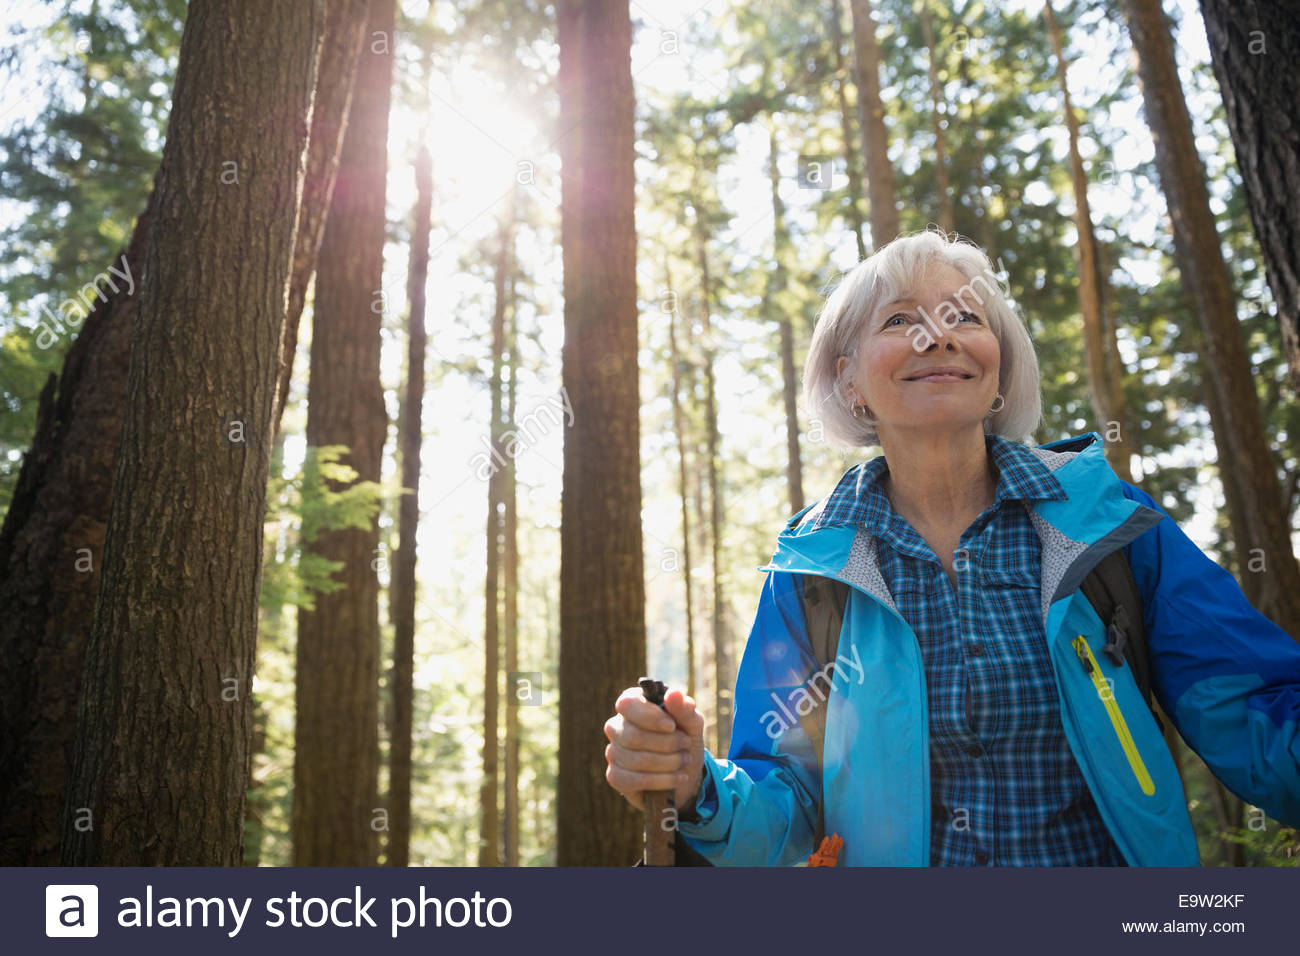 Smiling senior woman hiking below trees in woods - Stock Image